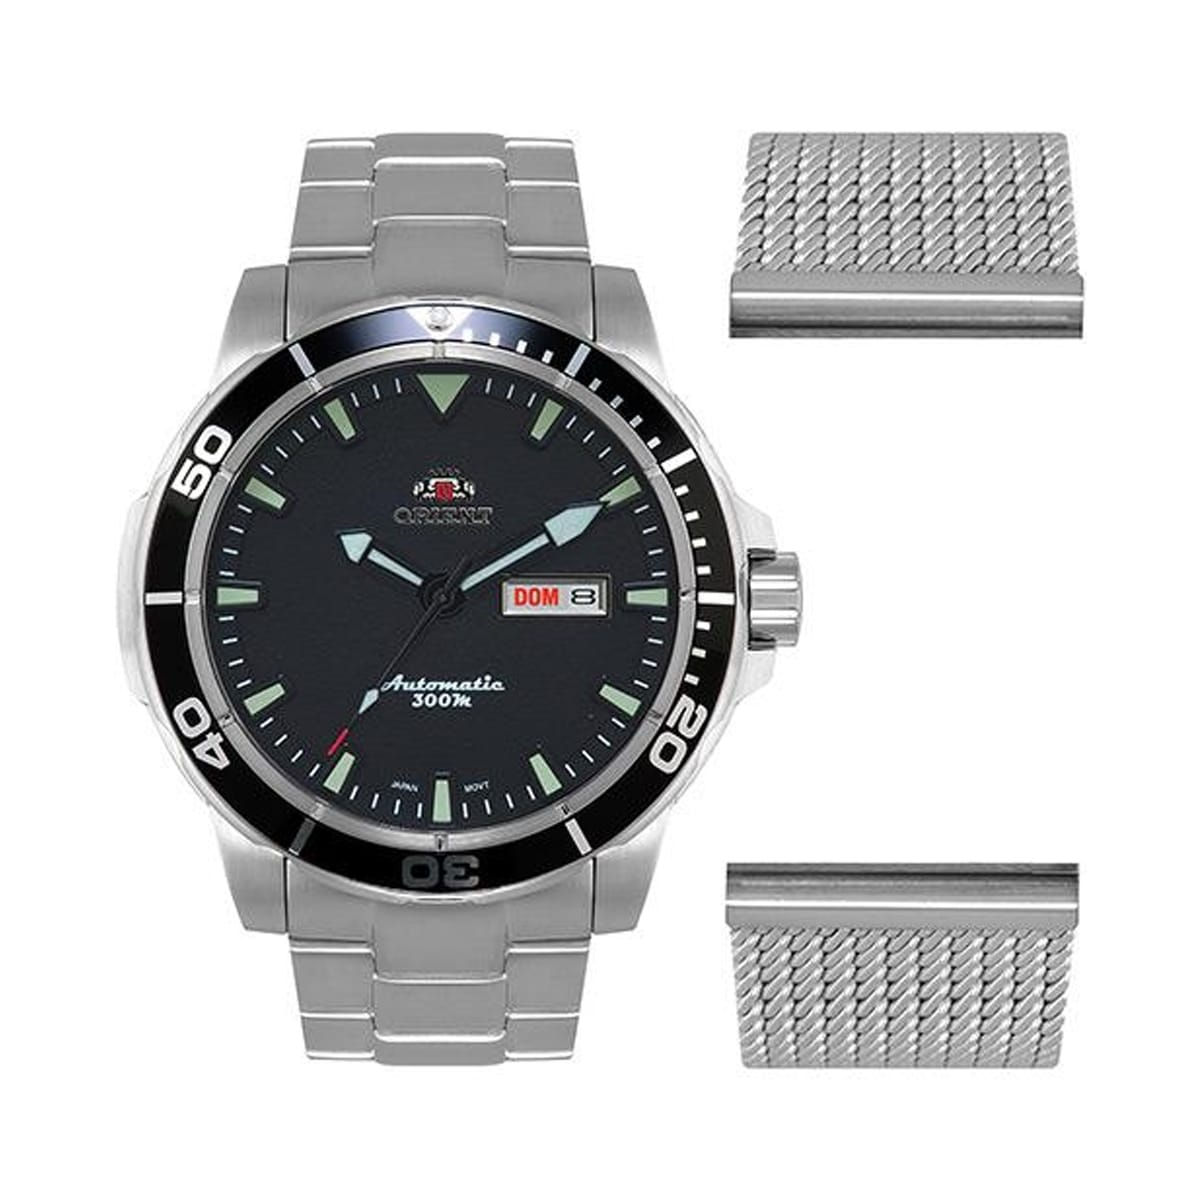 f53a646b1c1 Relógio Masculino - Orient - Feira dos Importados de Brasília - Sia - A  Loja Virtual